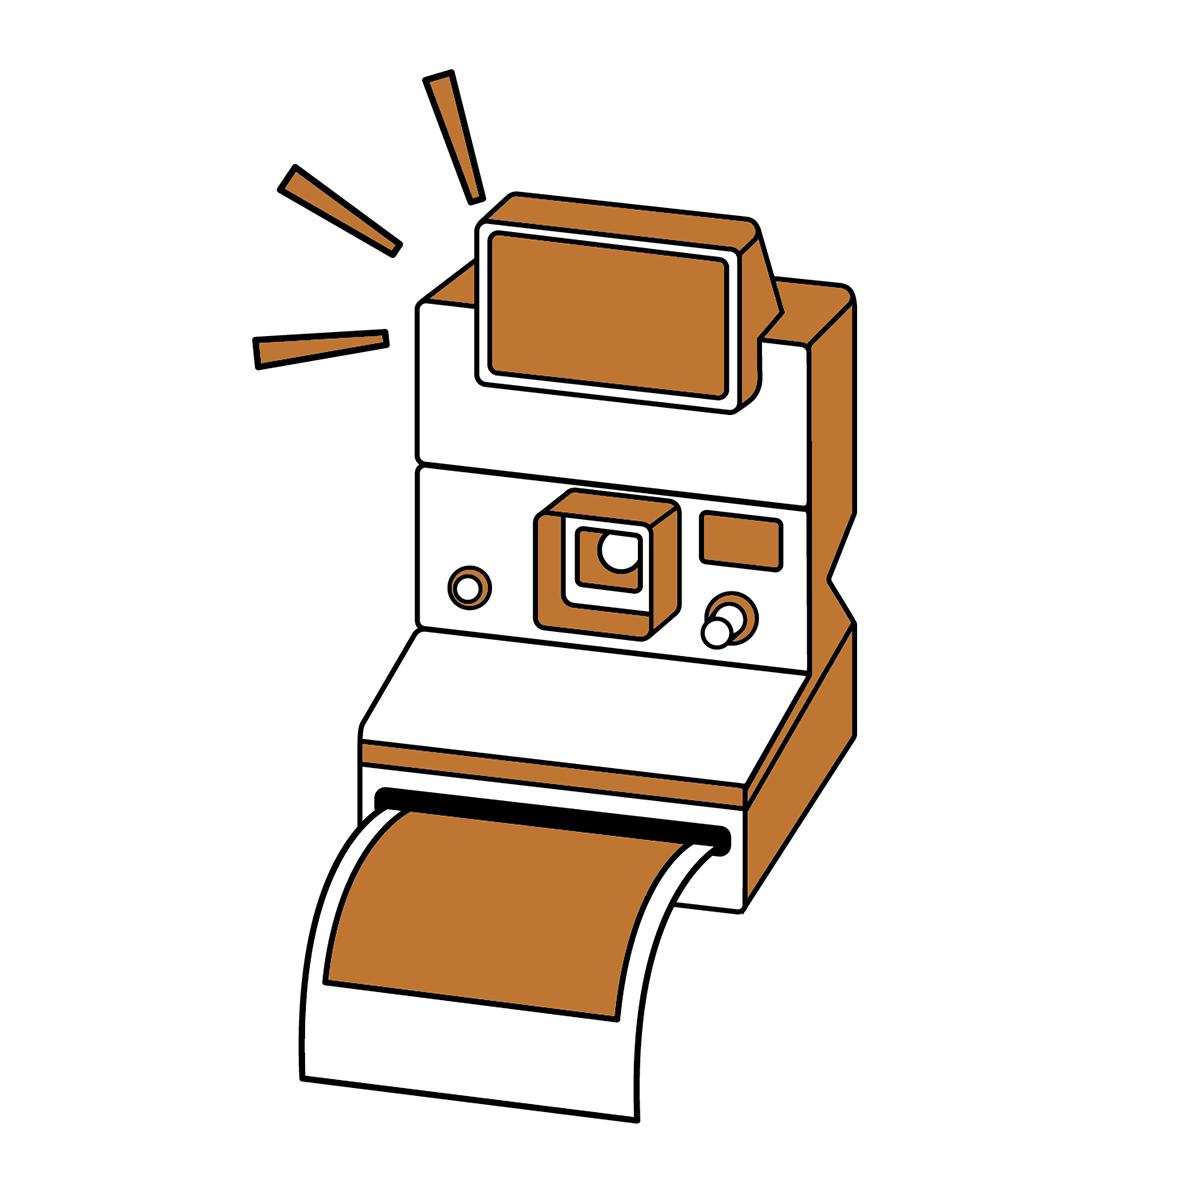 TAM87032 - Maskeringsteip med dispenser, 18 mm